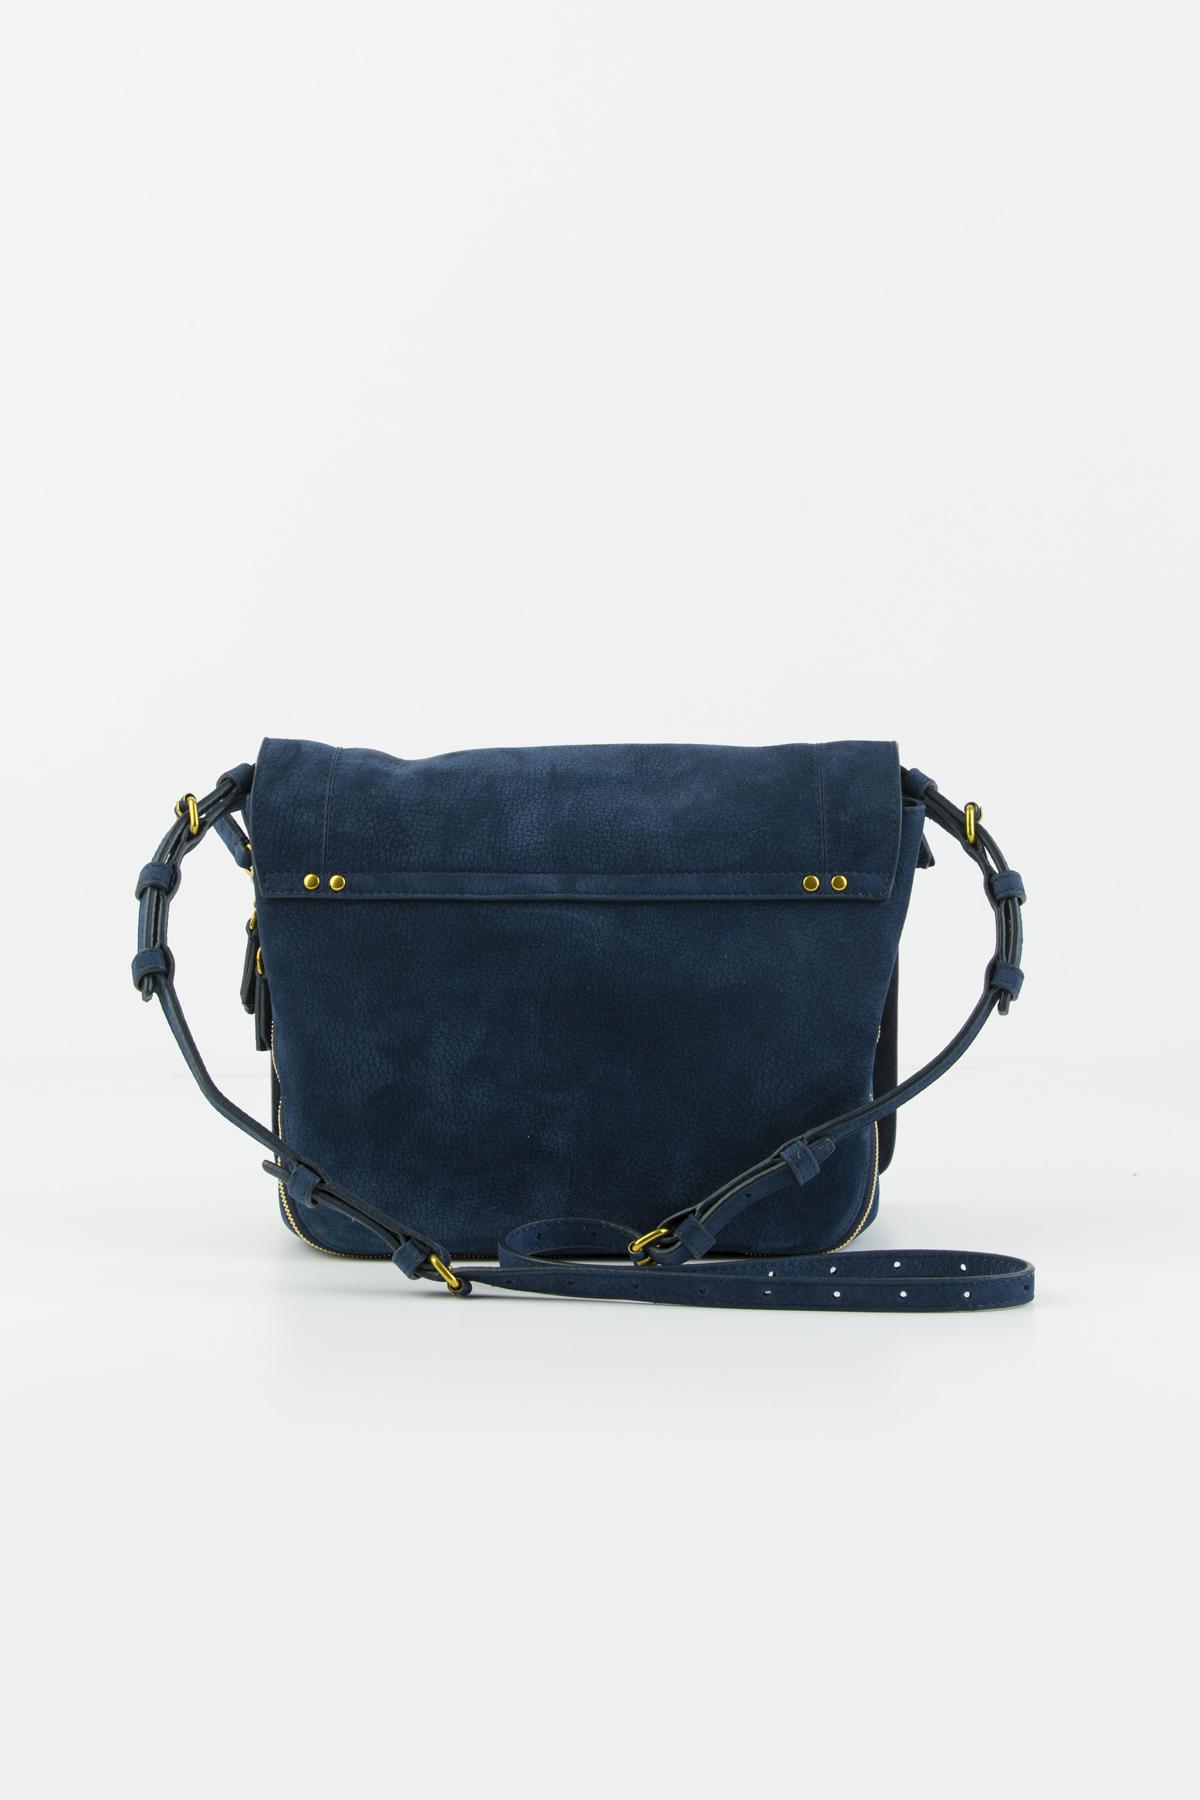 igor-marine-leather-bag-messenger-jerome-freyfuss-matchboxathens